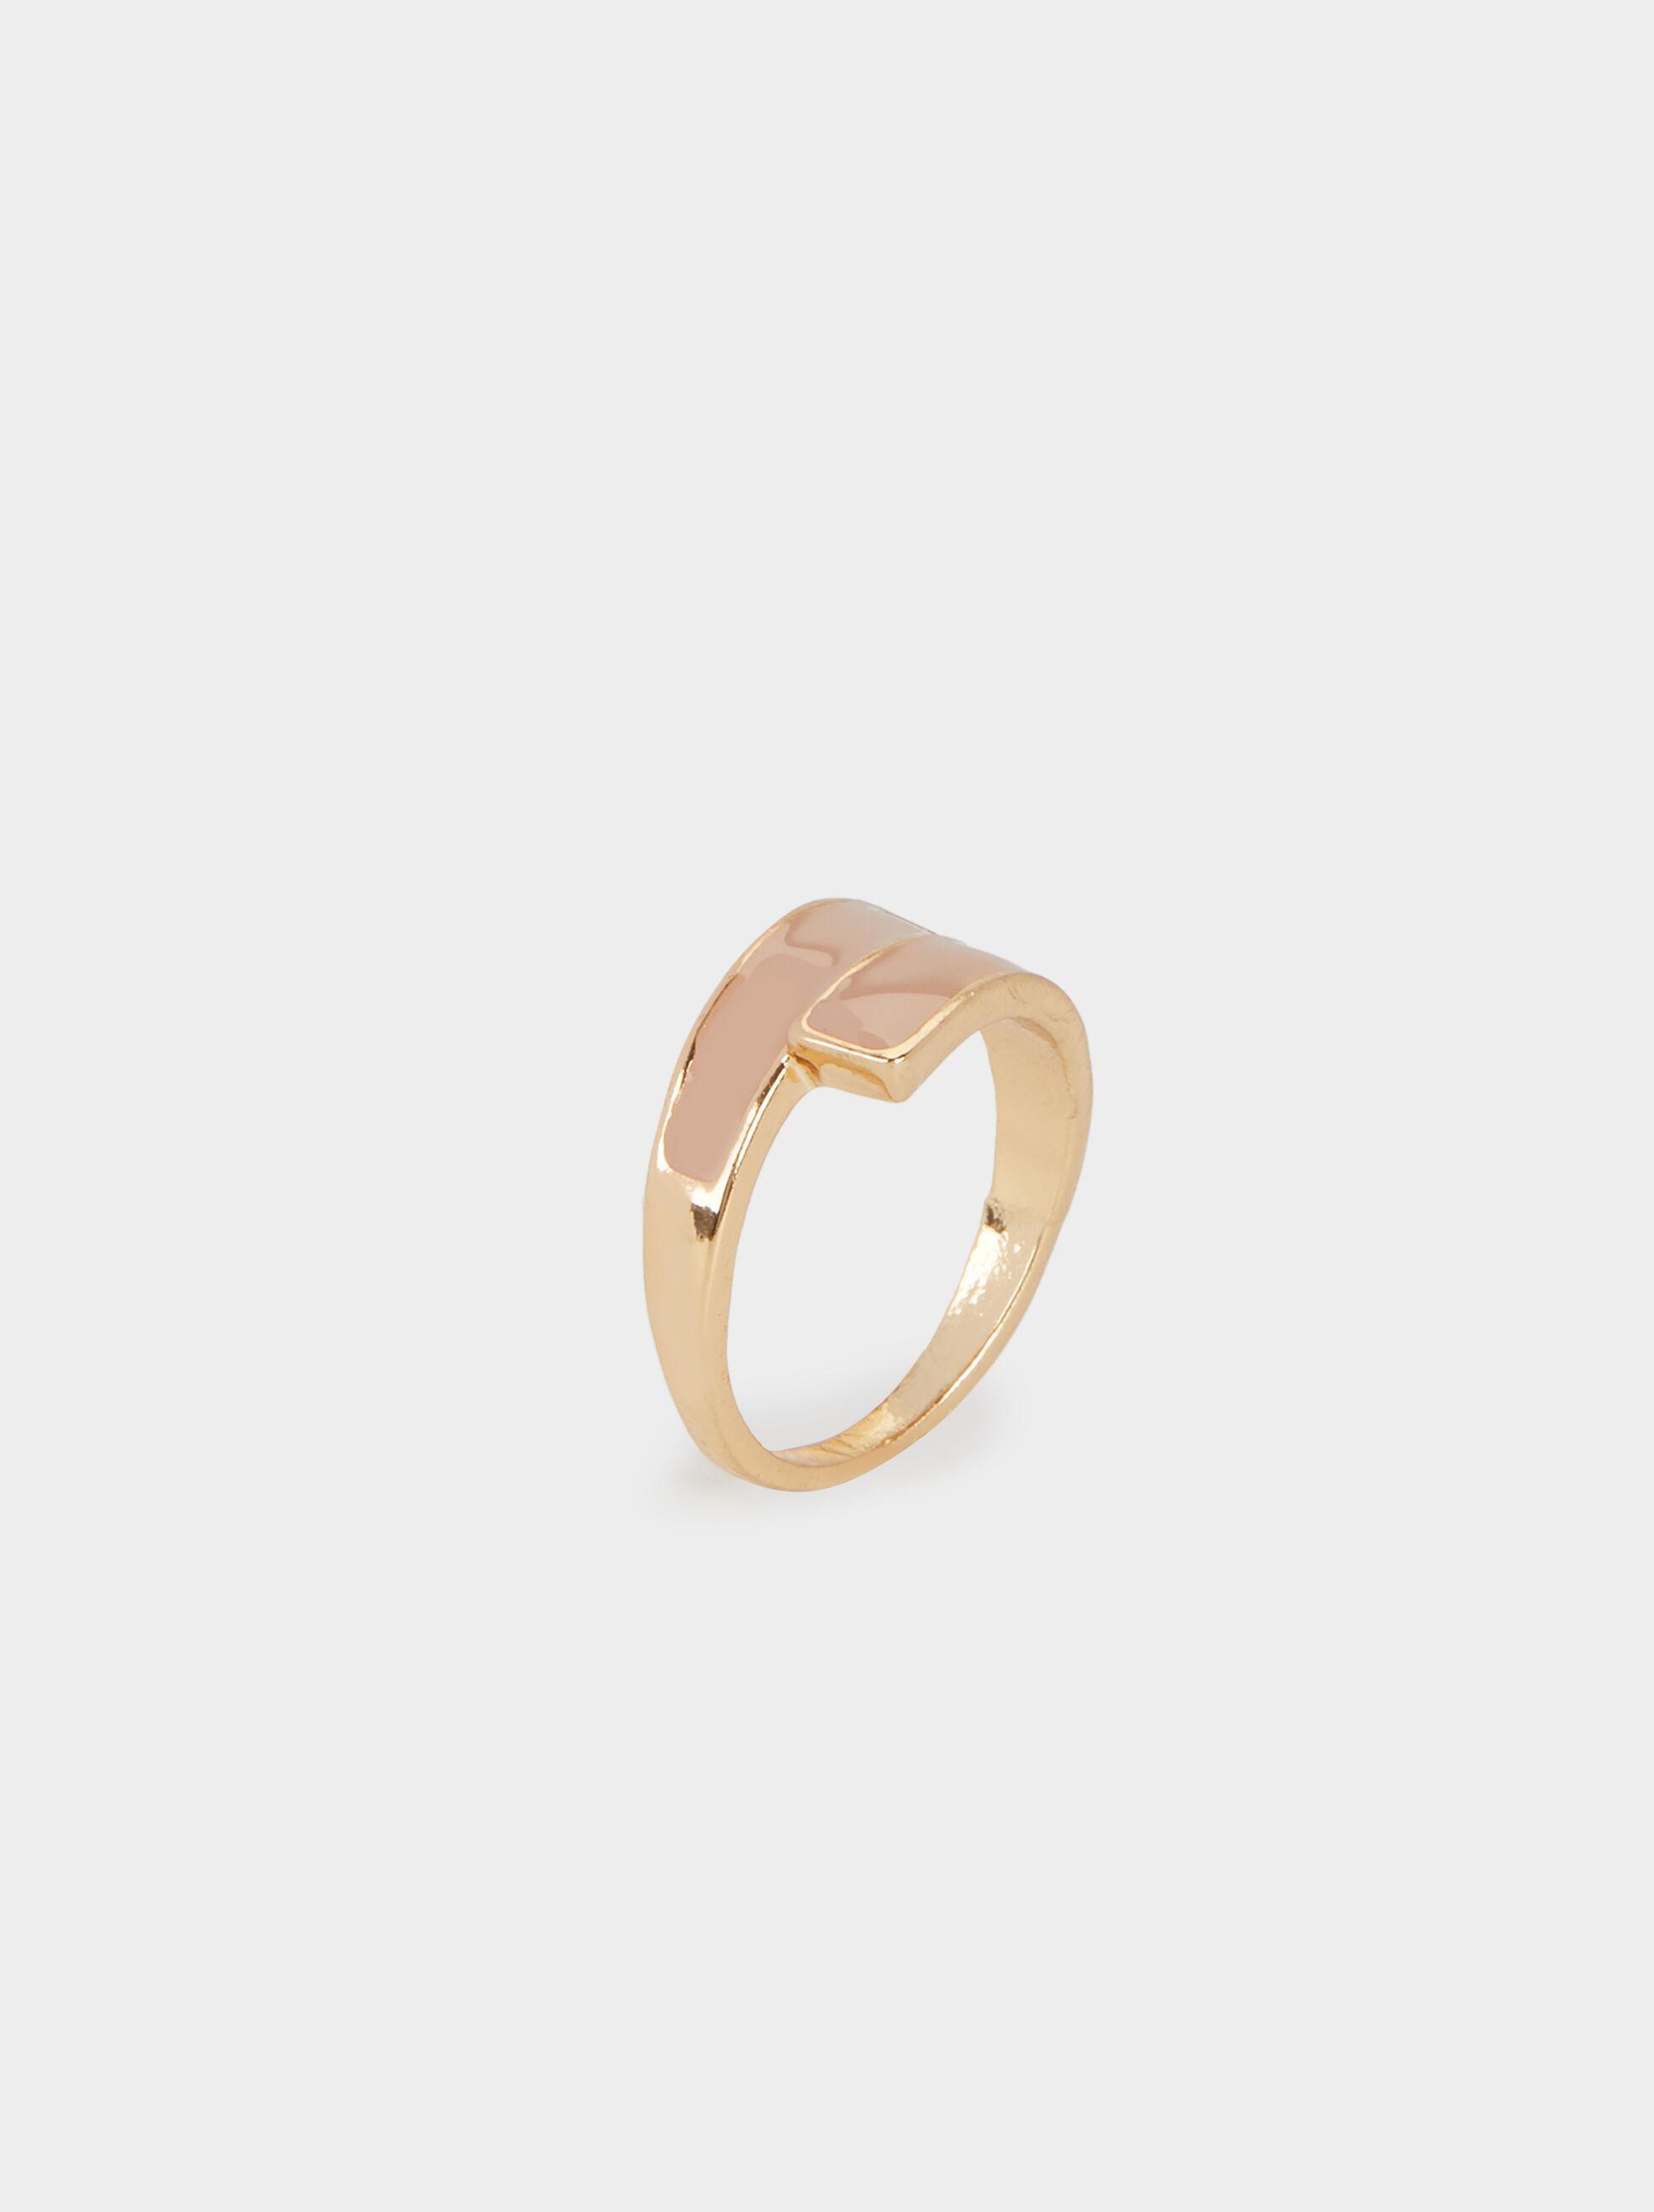 Land Overlapped Ring, , hi-res